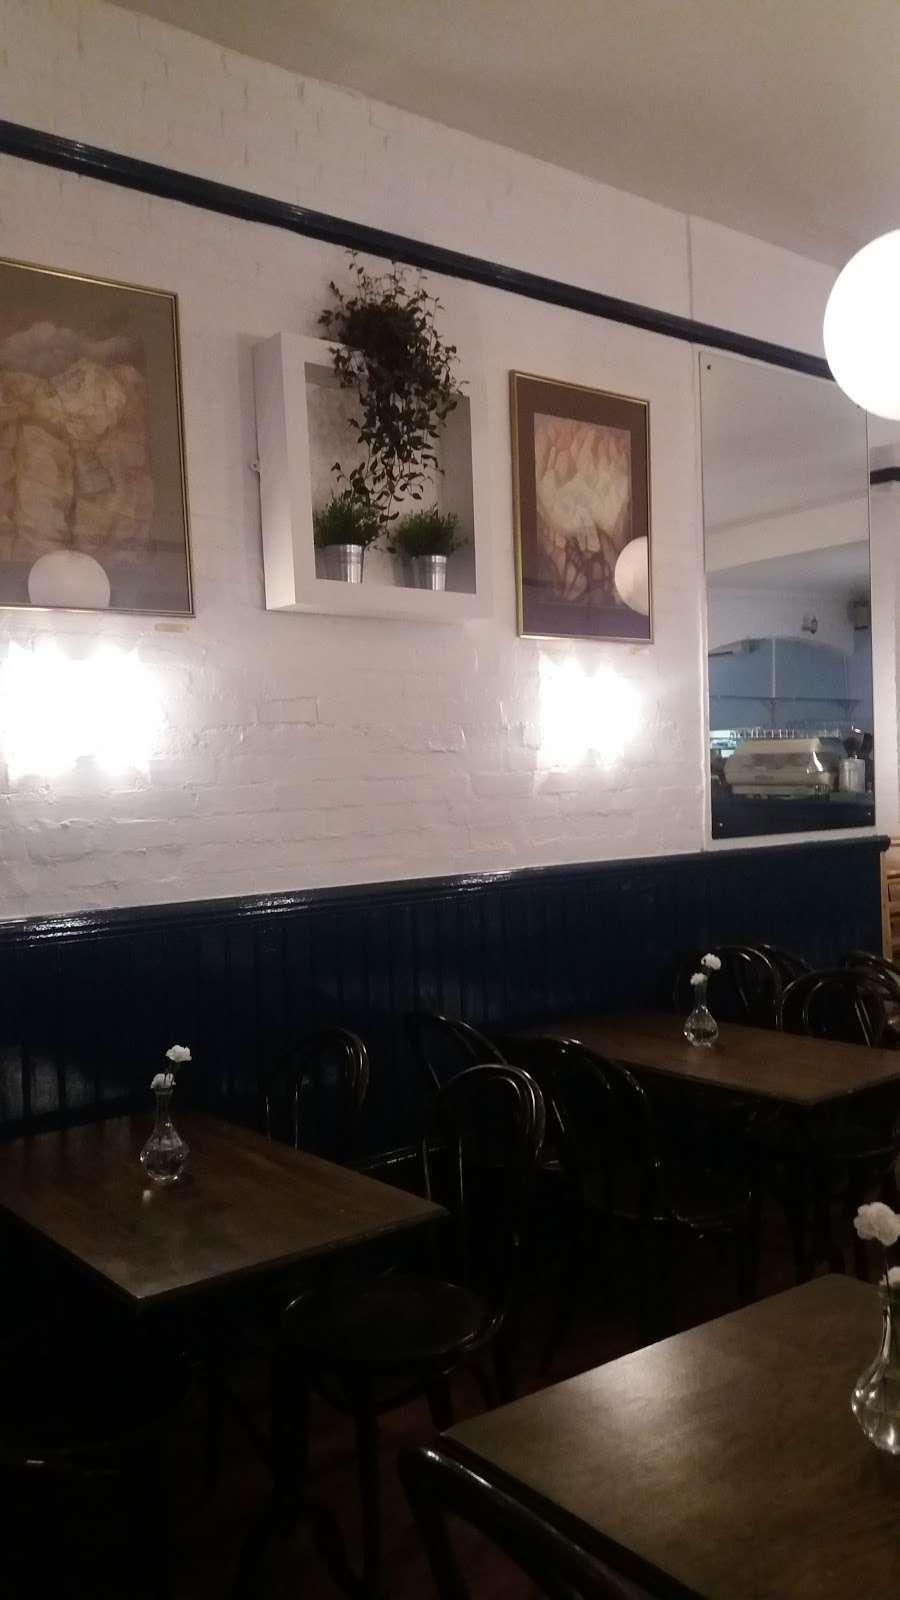 STELLAS ROOM - cafe  | Photo 10 of 10 | Address: 46 Fortis Green Rd, London N10 3HN, UK | Phone: 07789 250612